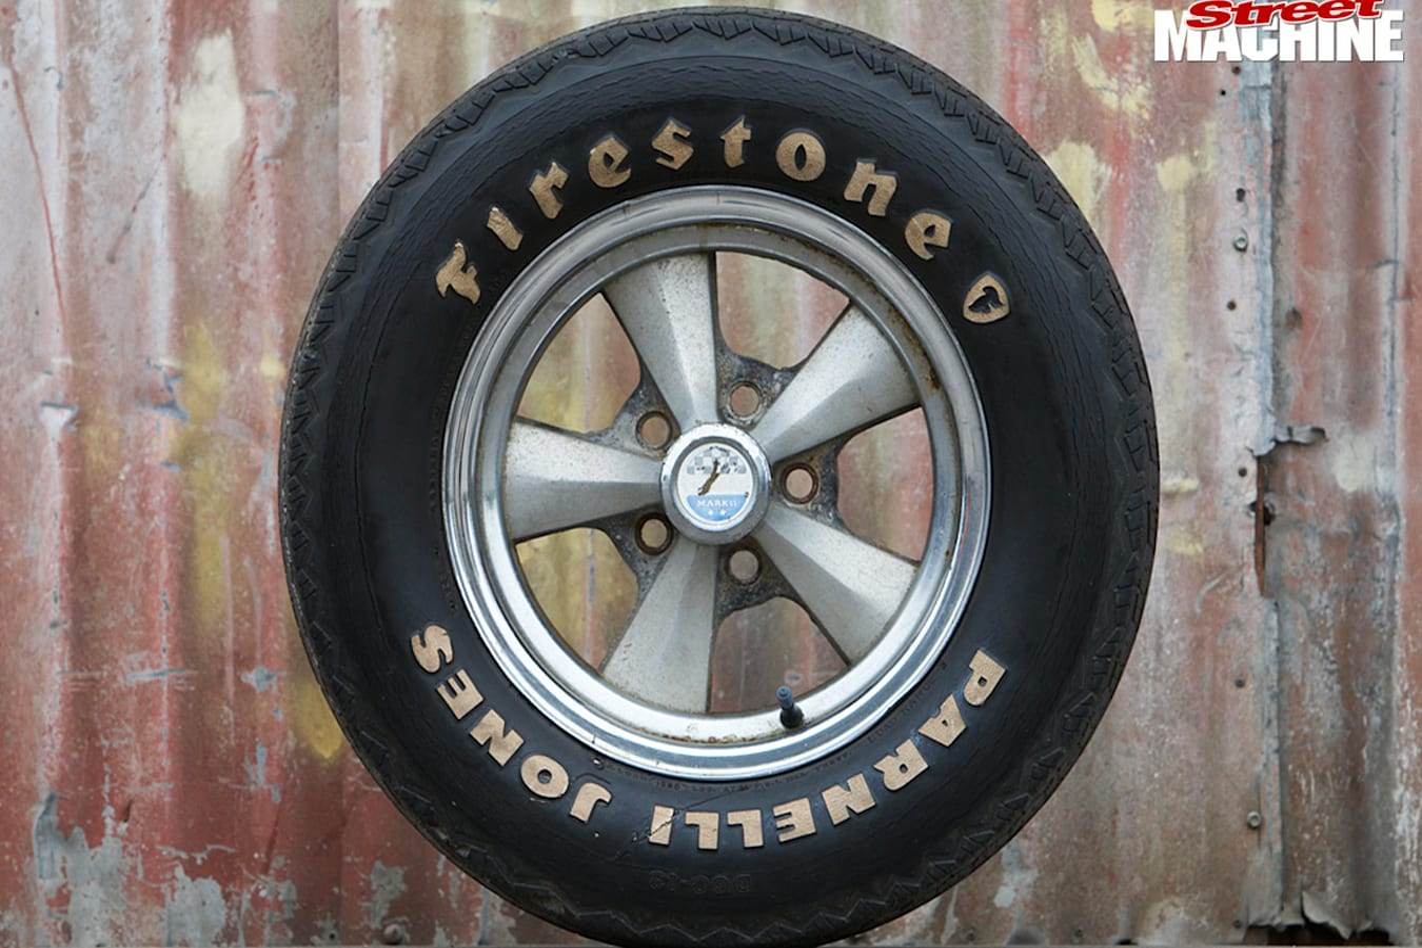 Tasman wheel